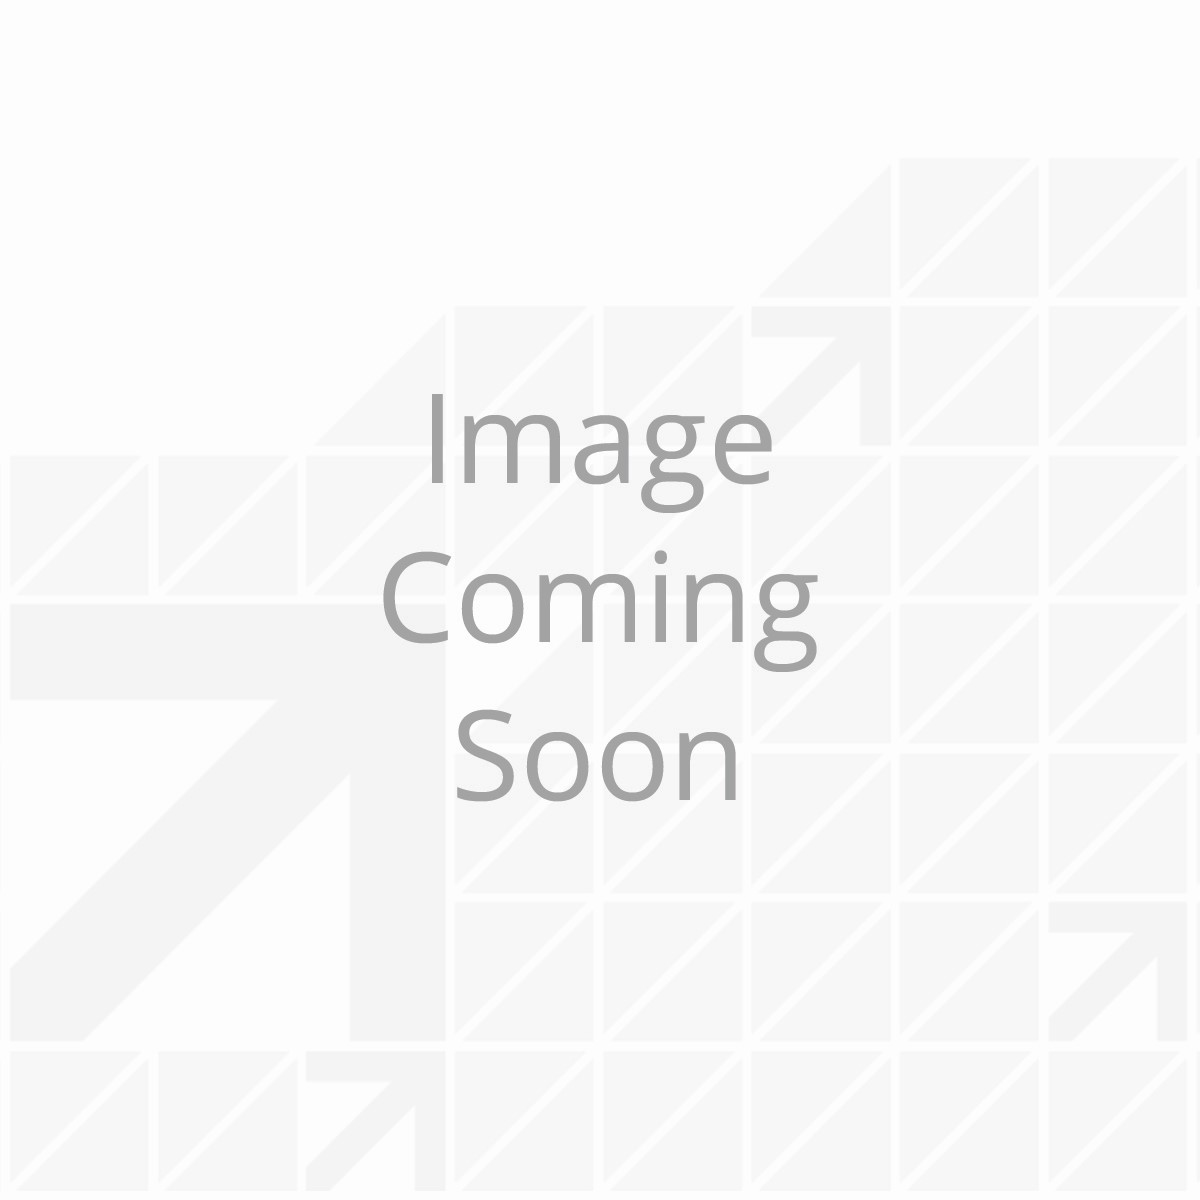 "Awnbrella™ Velcro Loop - 2"" x 4"" (White)"